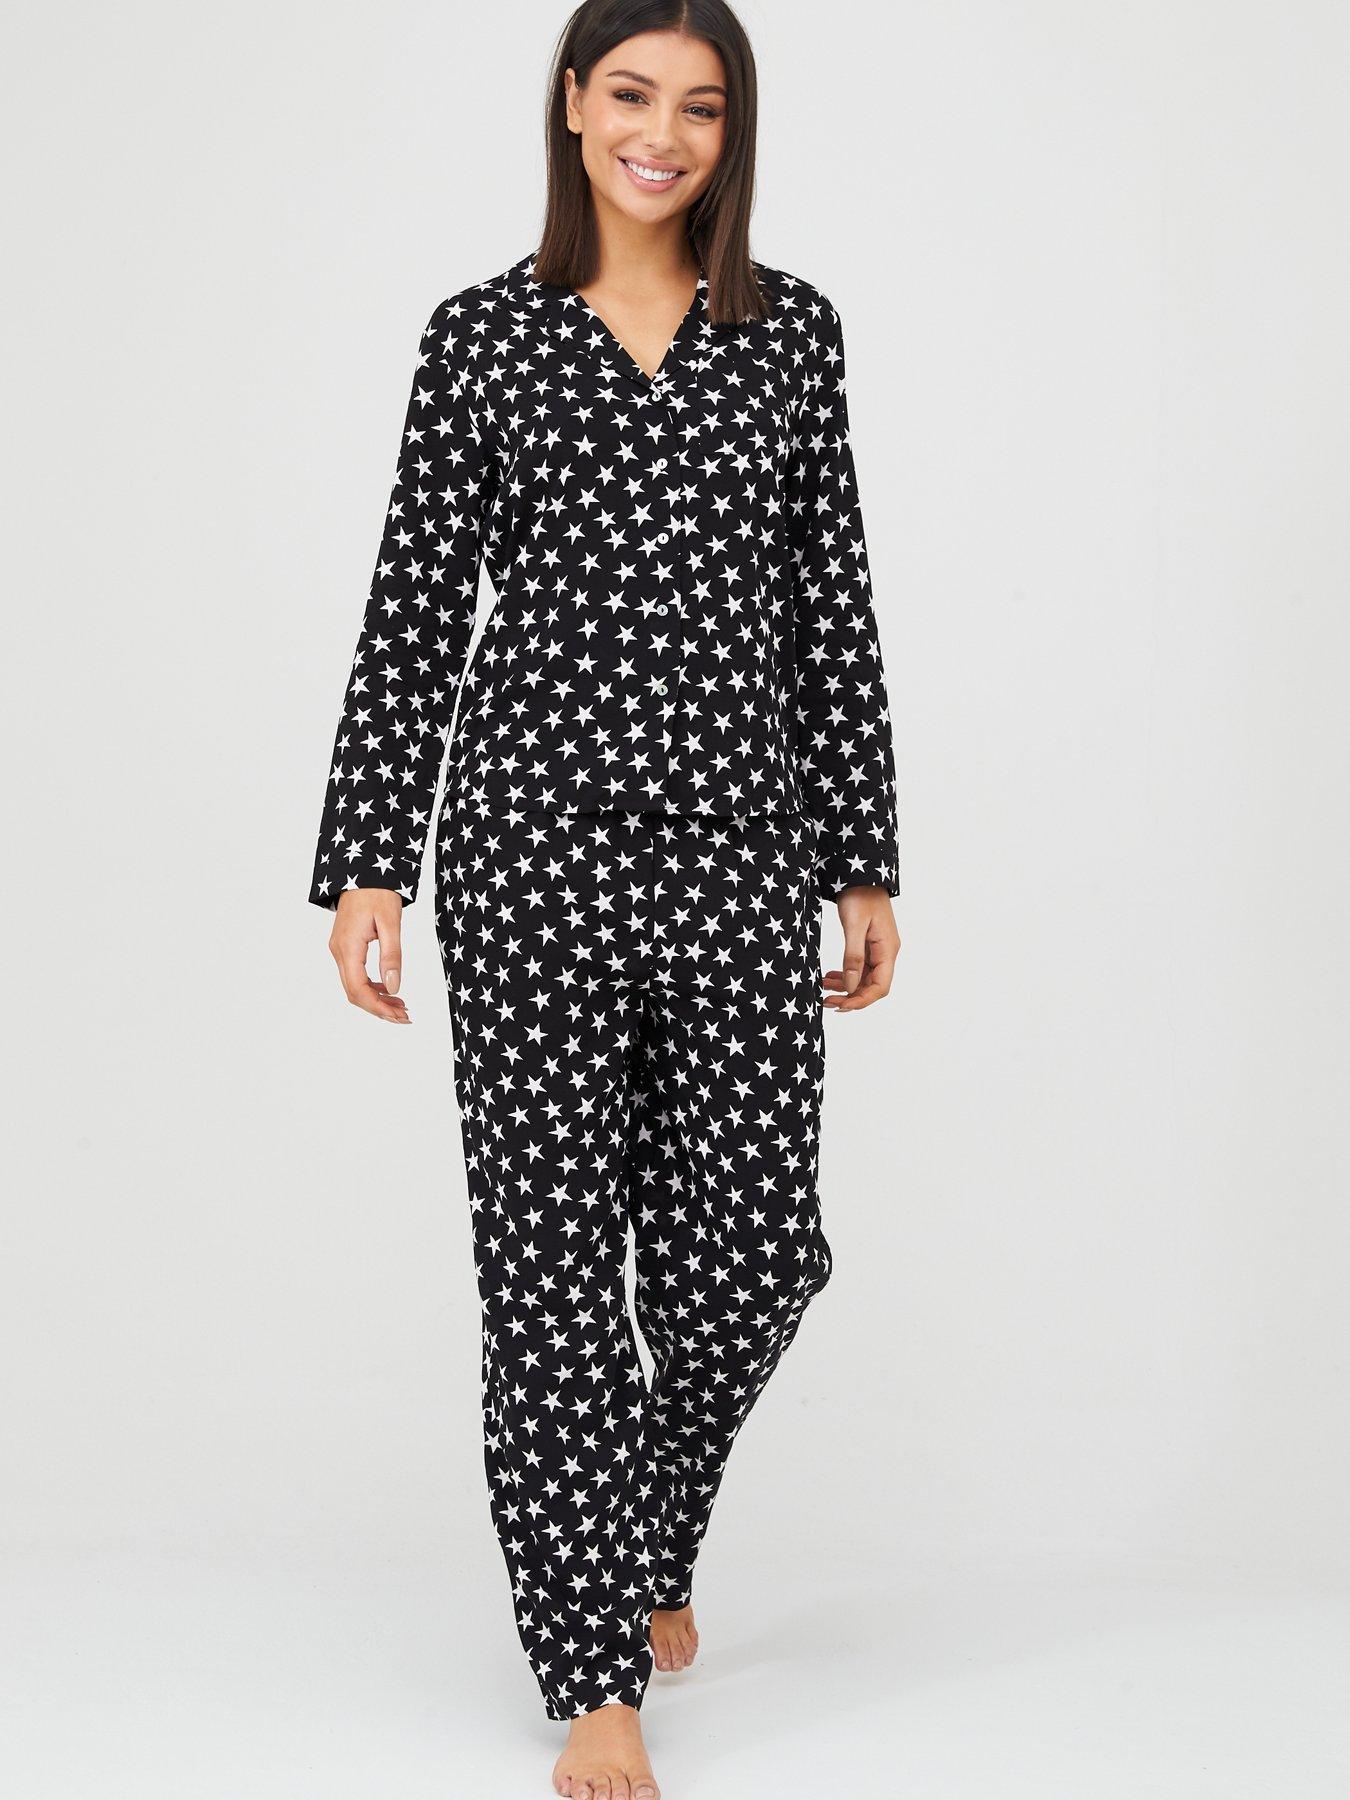 Ladies Character Pj/'s Full Length Vest Top Leggings Pyjama Set Lounge Wear Pants